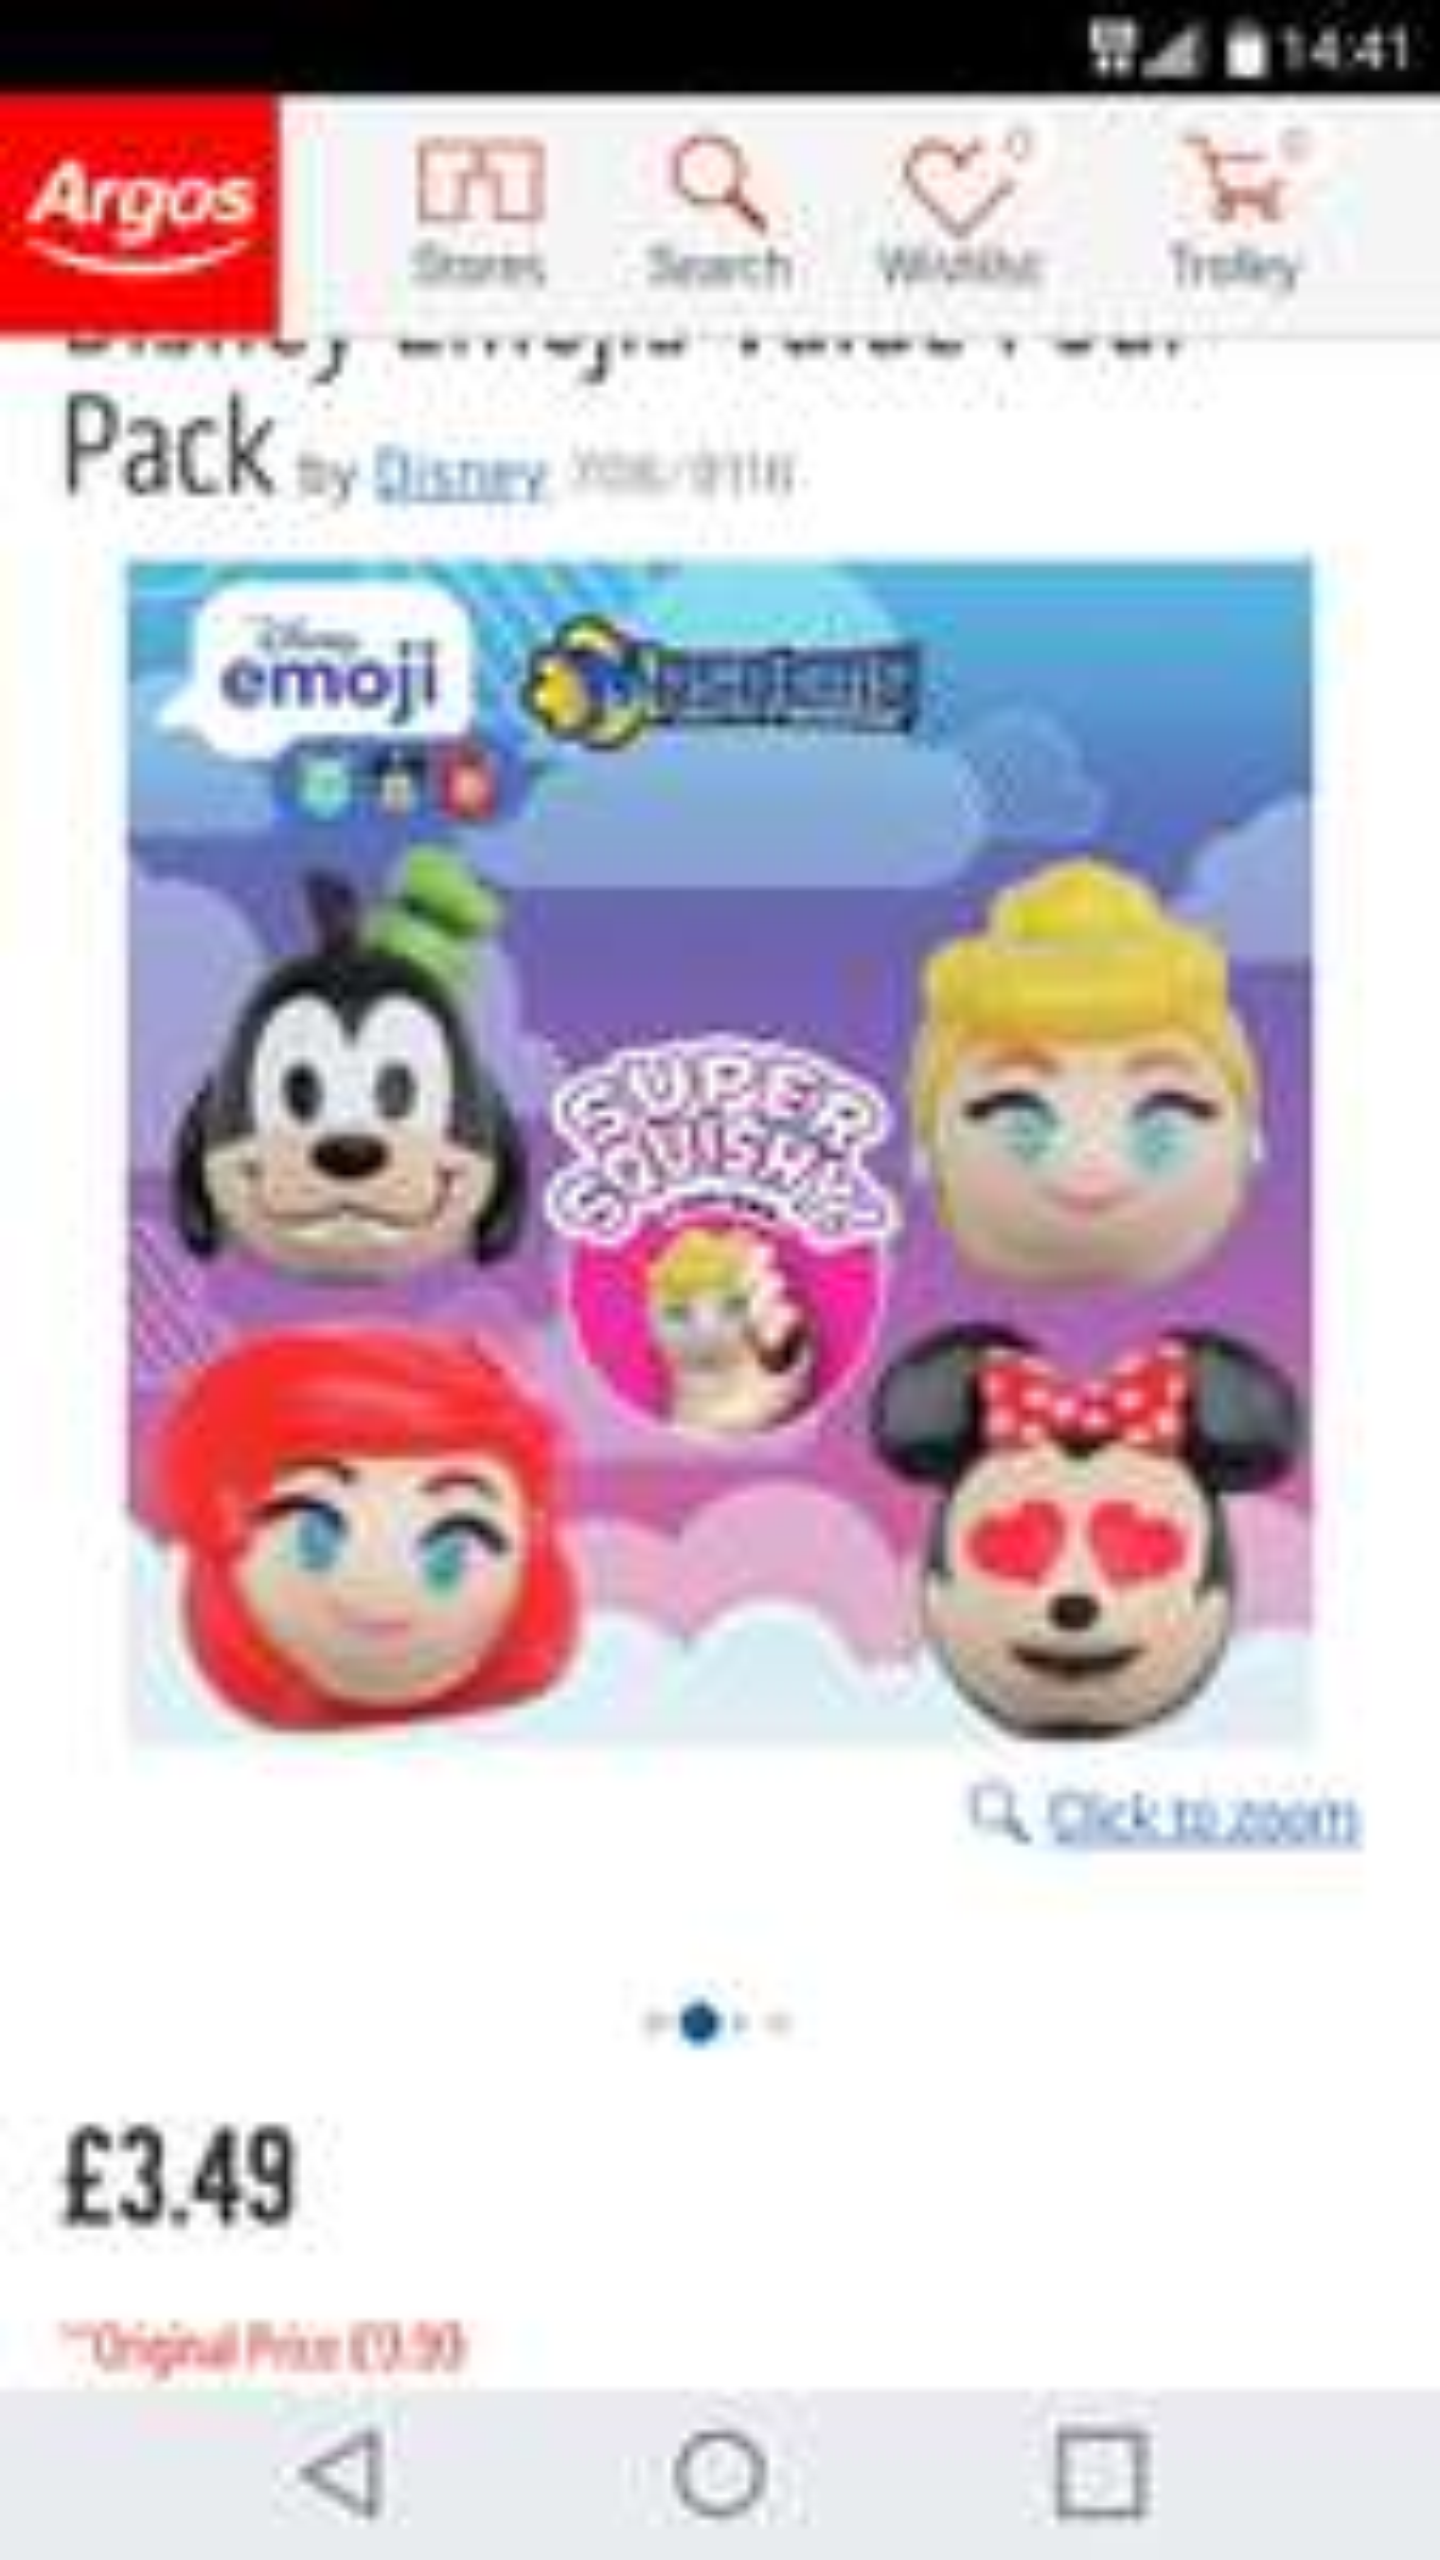 Disney emoji squishies at Argos for £3.50